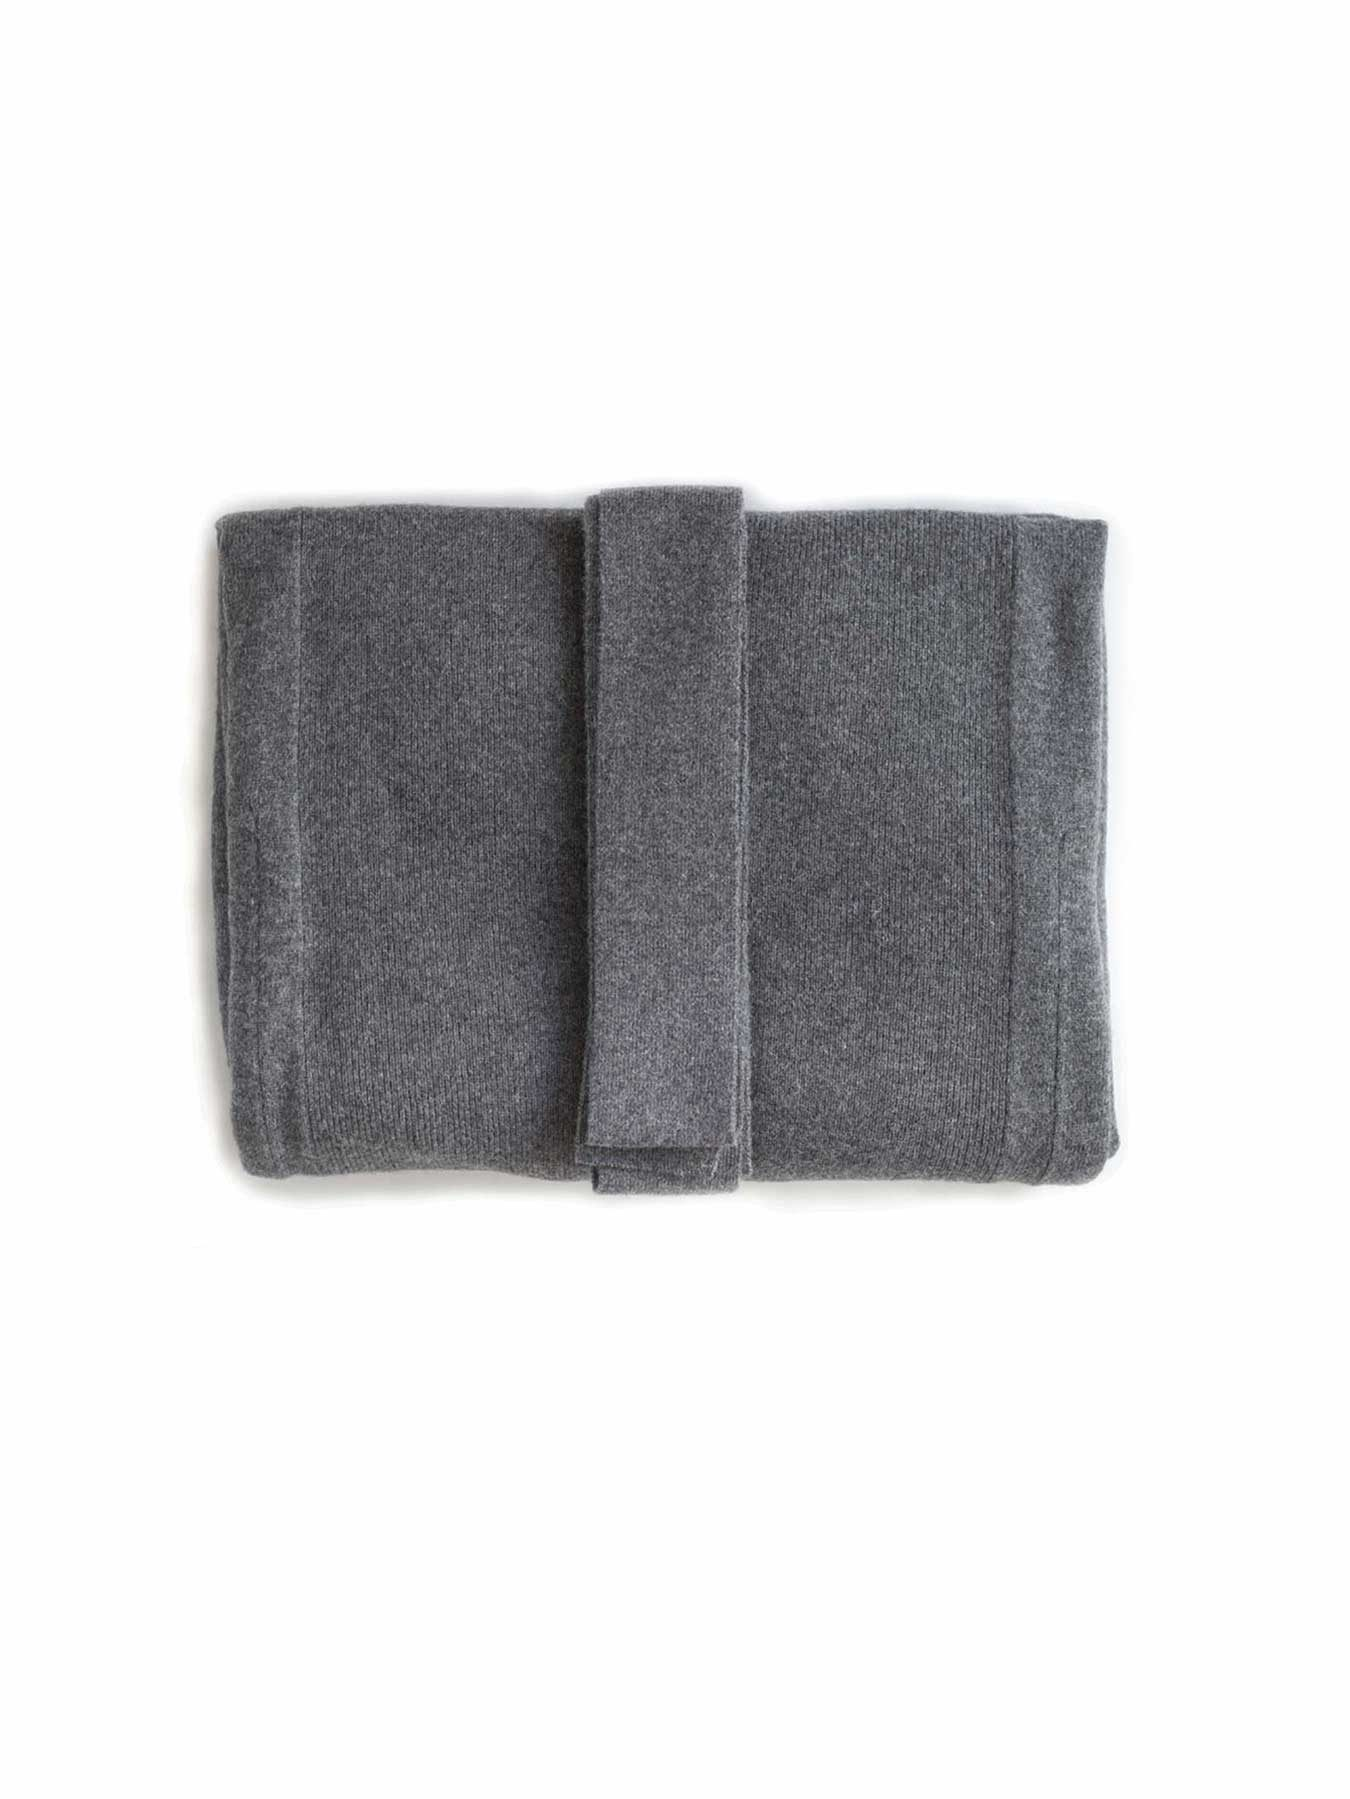 Versatile-Long-Cardigan-Grey-m2